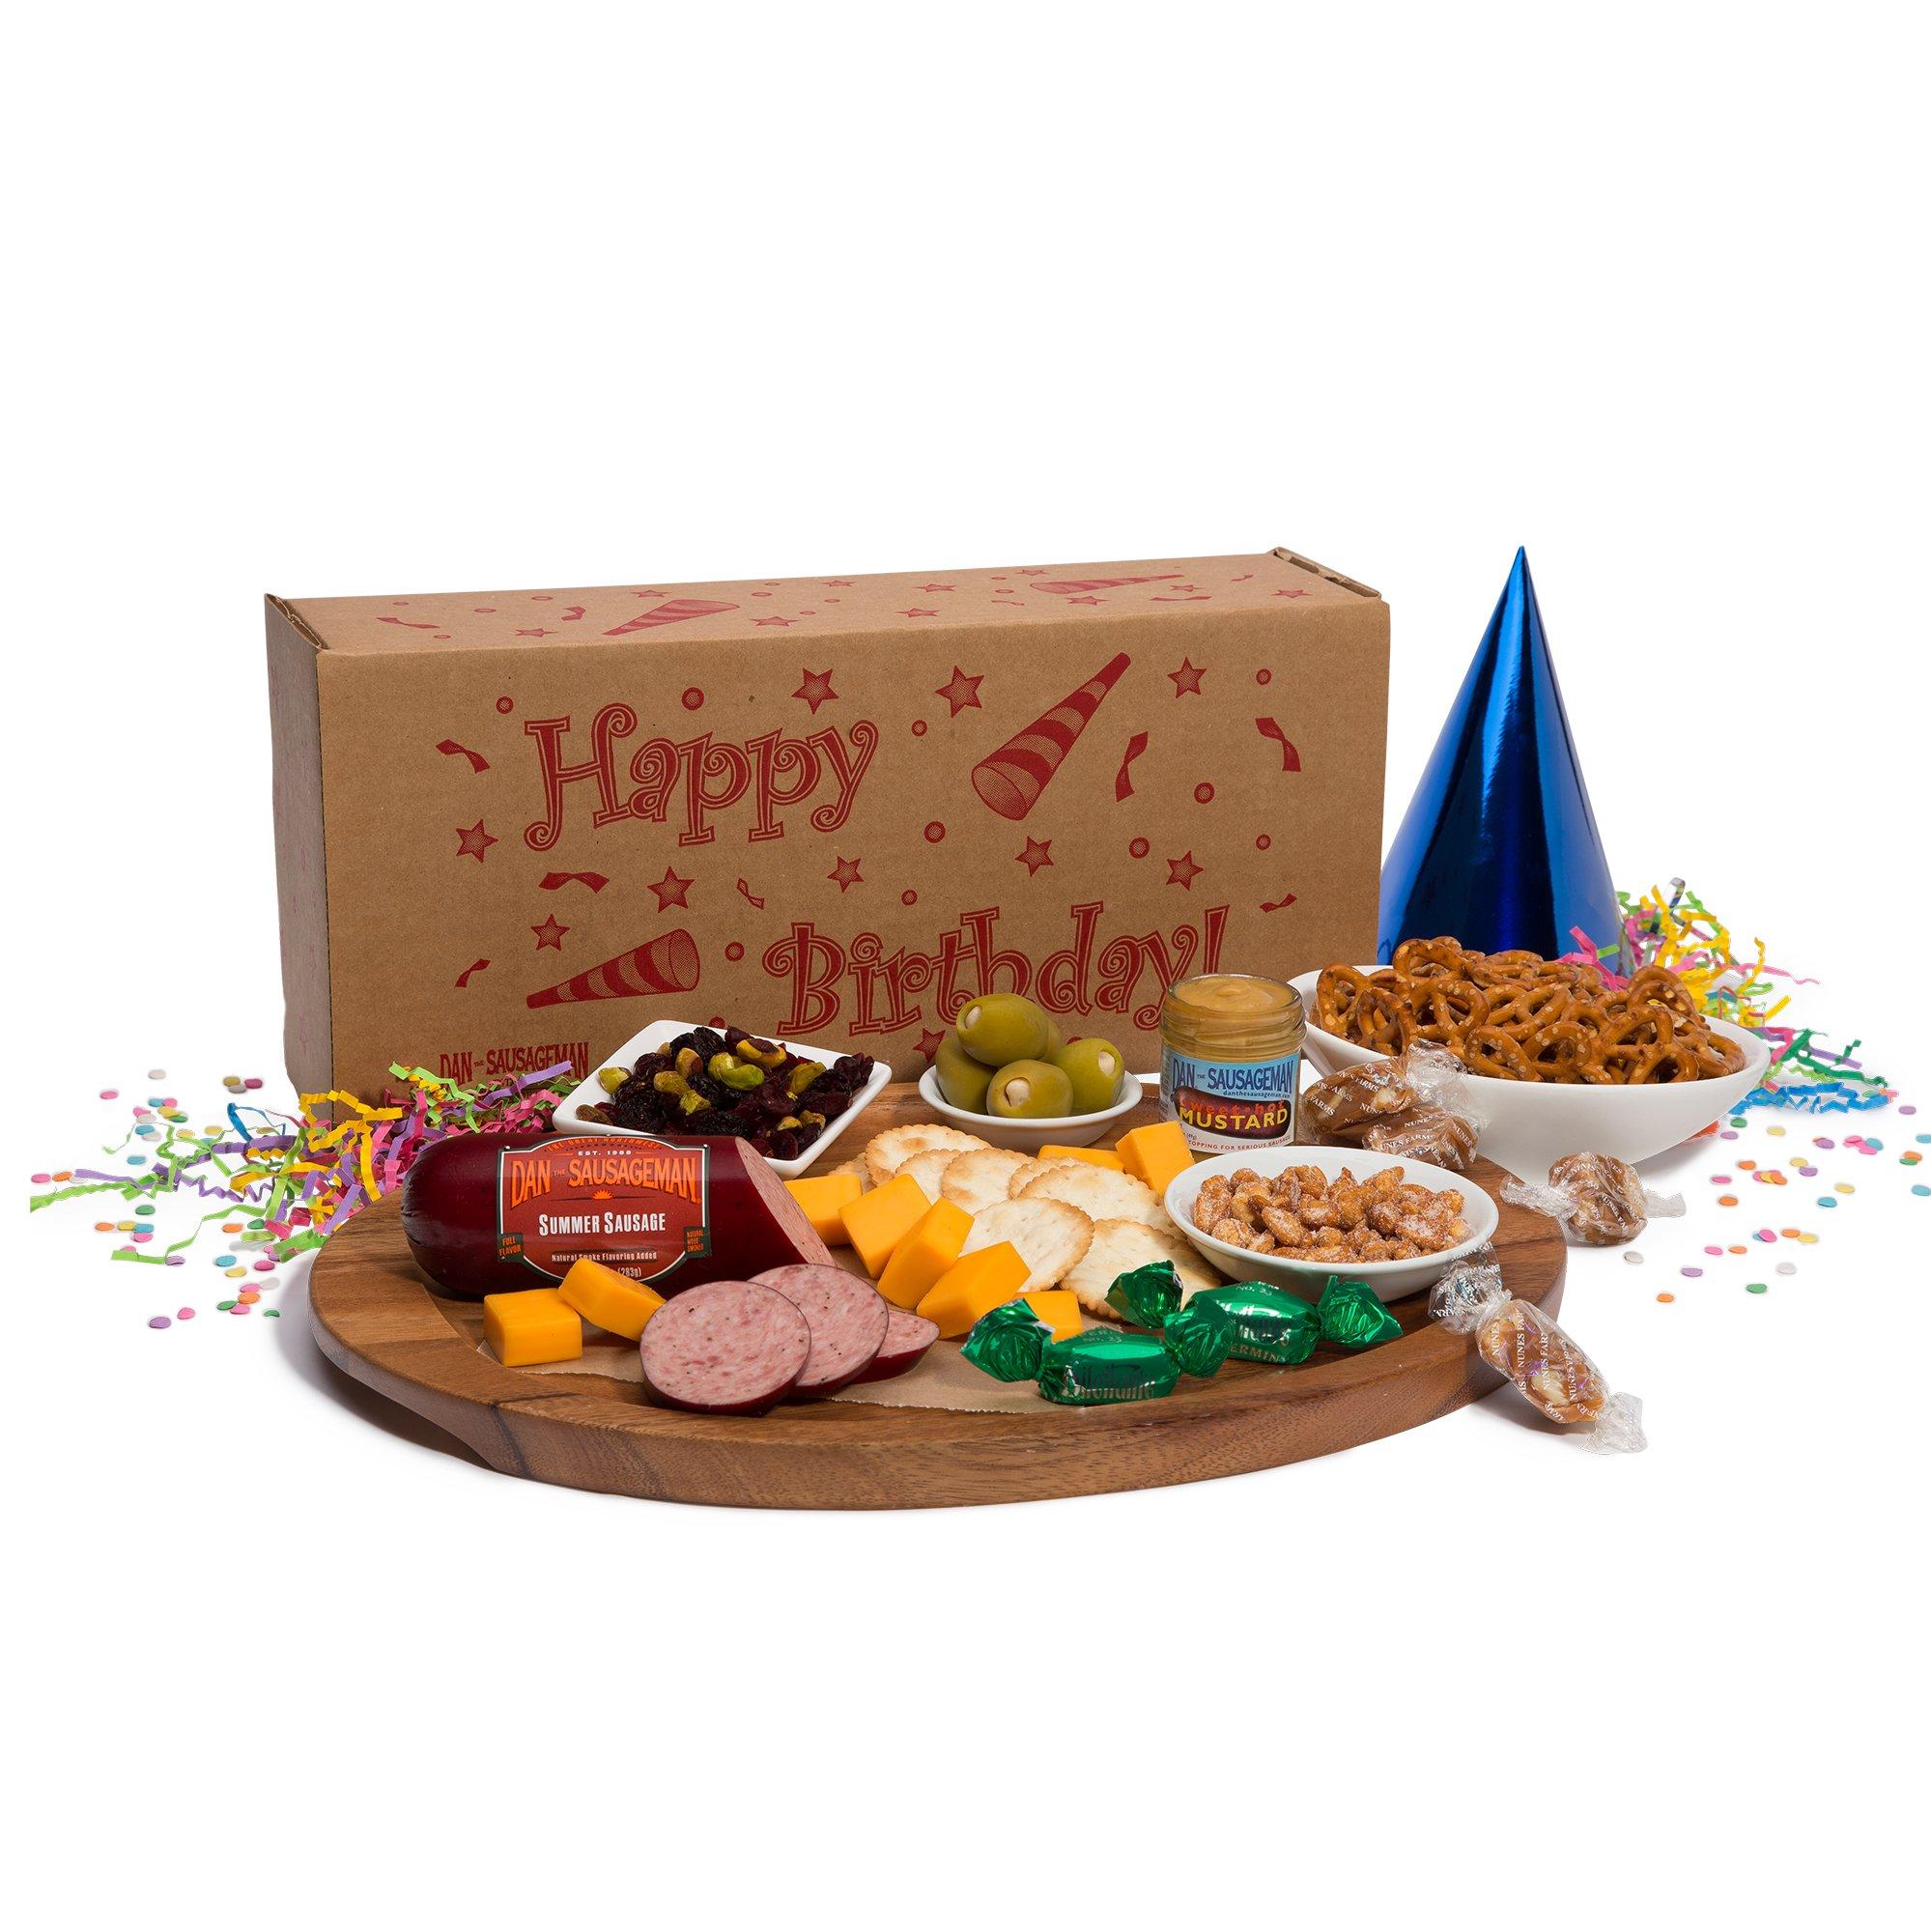 Dan the Sausageman's Happy Birthday Box Featuring Dan's Original Summer Sausage, Wisconsin Cheese, and Sweet Hot Mustard